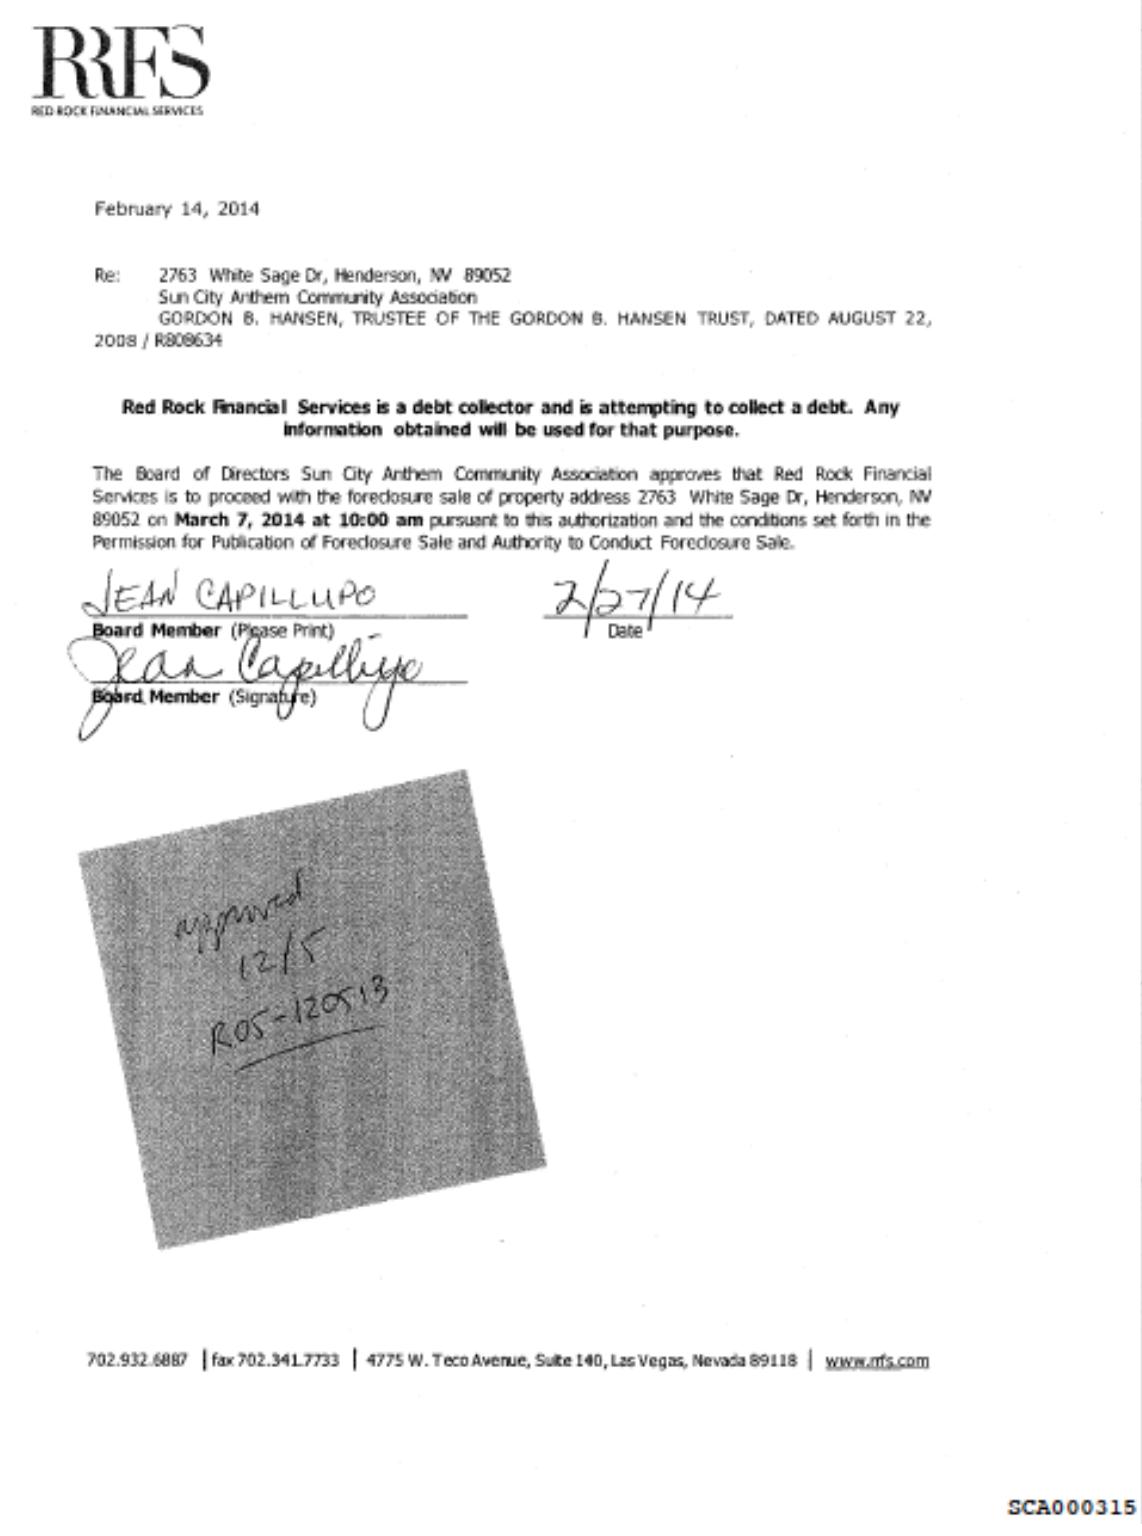 Deceptive disclosures: SCA Board 12/5/13 meeting vs. SCA 315 & RRFS 128